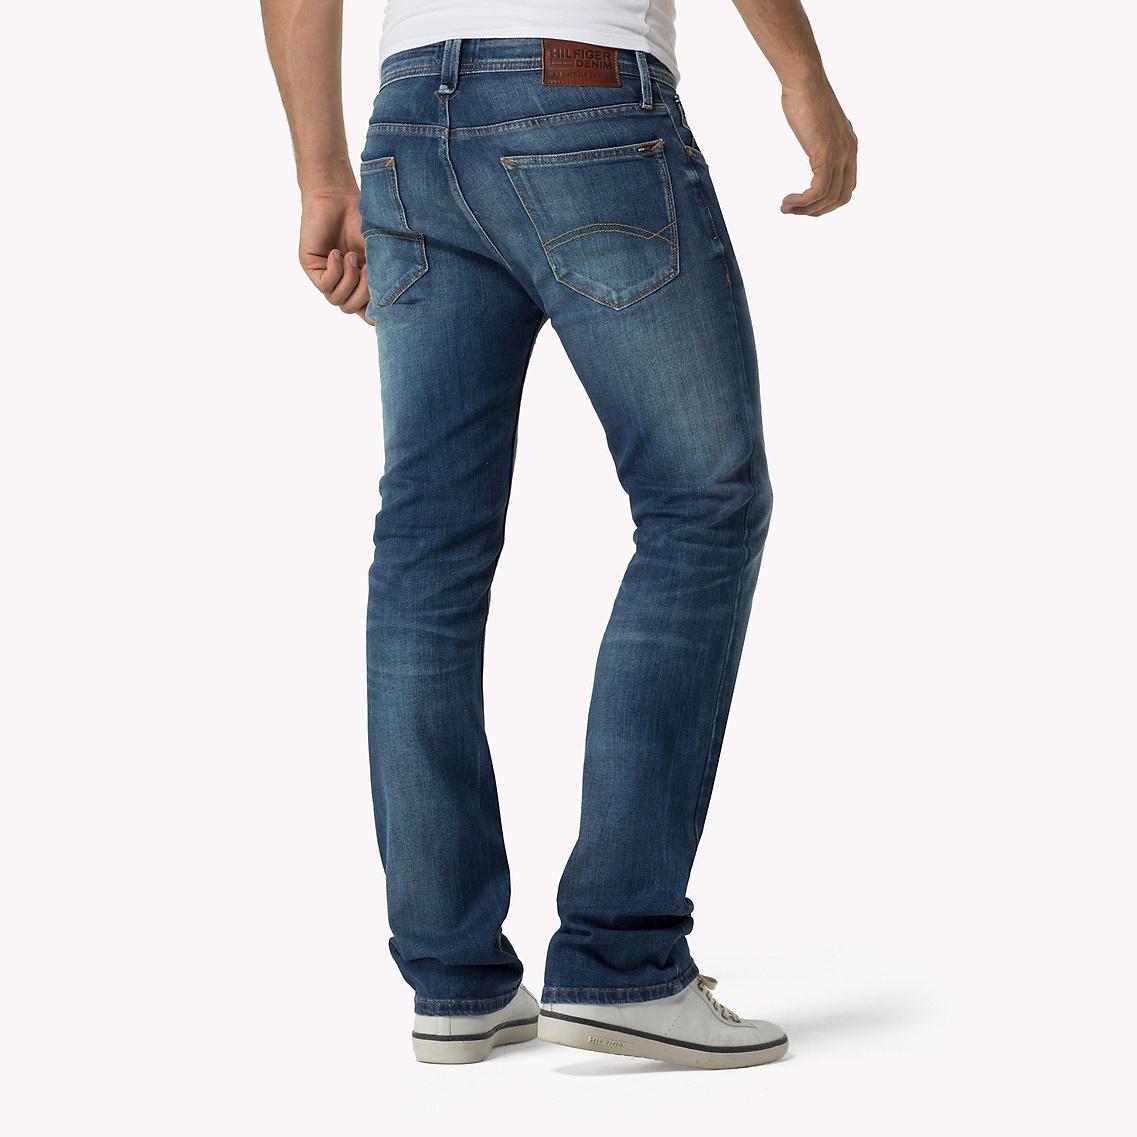 tommy hilfiger straight fit bootcut jeans in blue for men. Black Bedroom Furniture Sets. Home Design Ideas